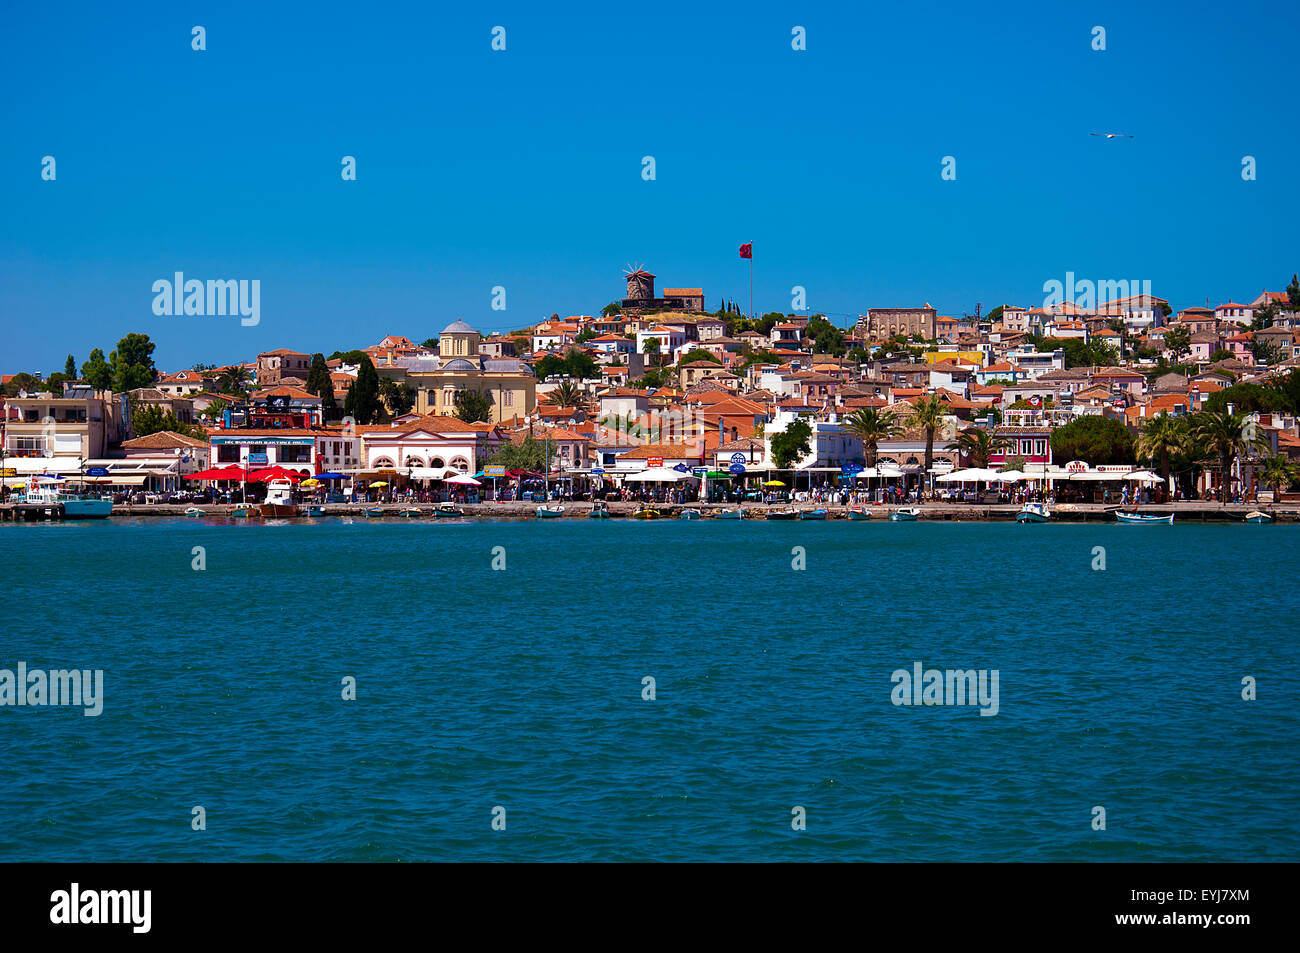 Coast of summer town Cunda Island at Ayvalik, Balikesir, Turkey - Stock Image